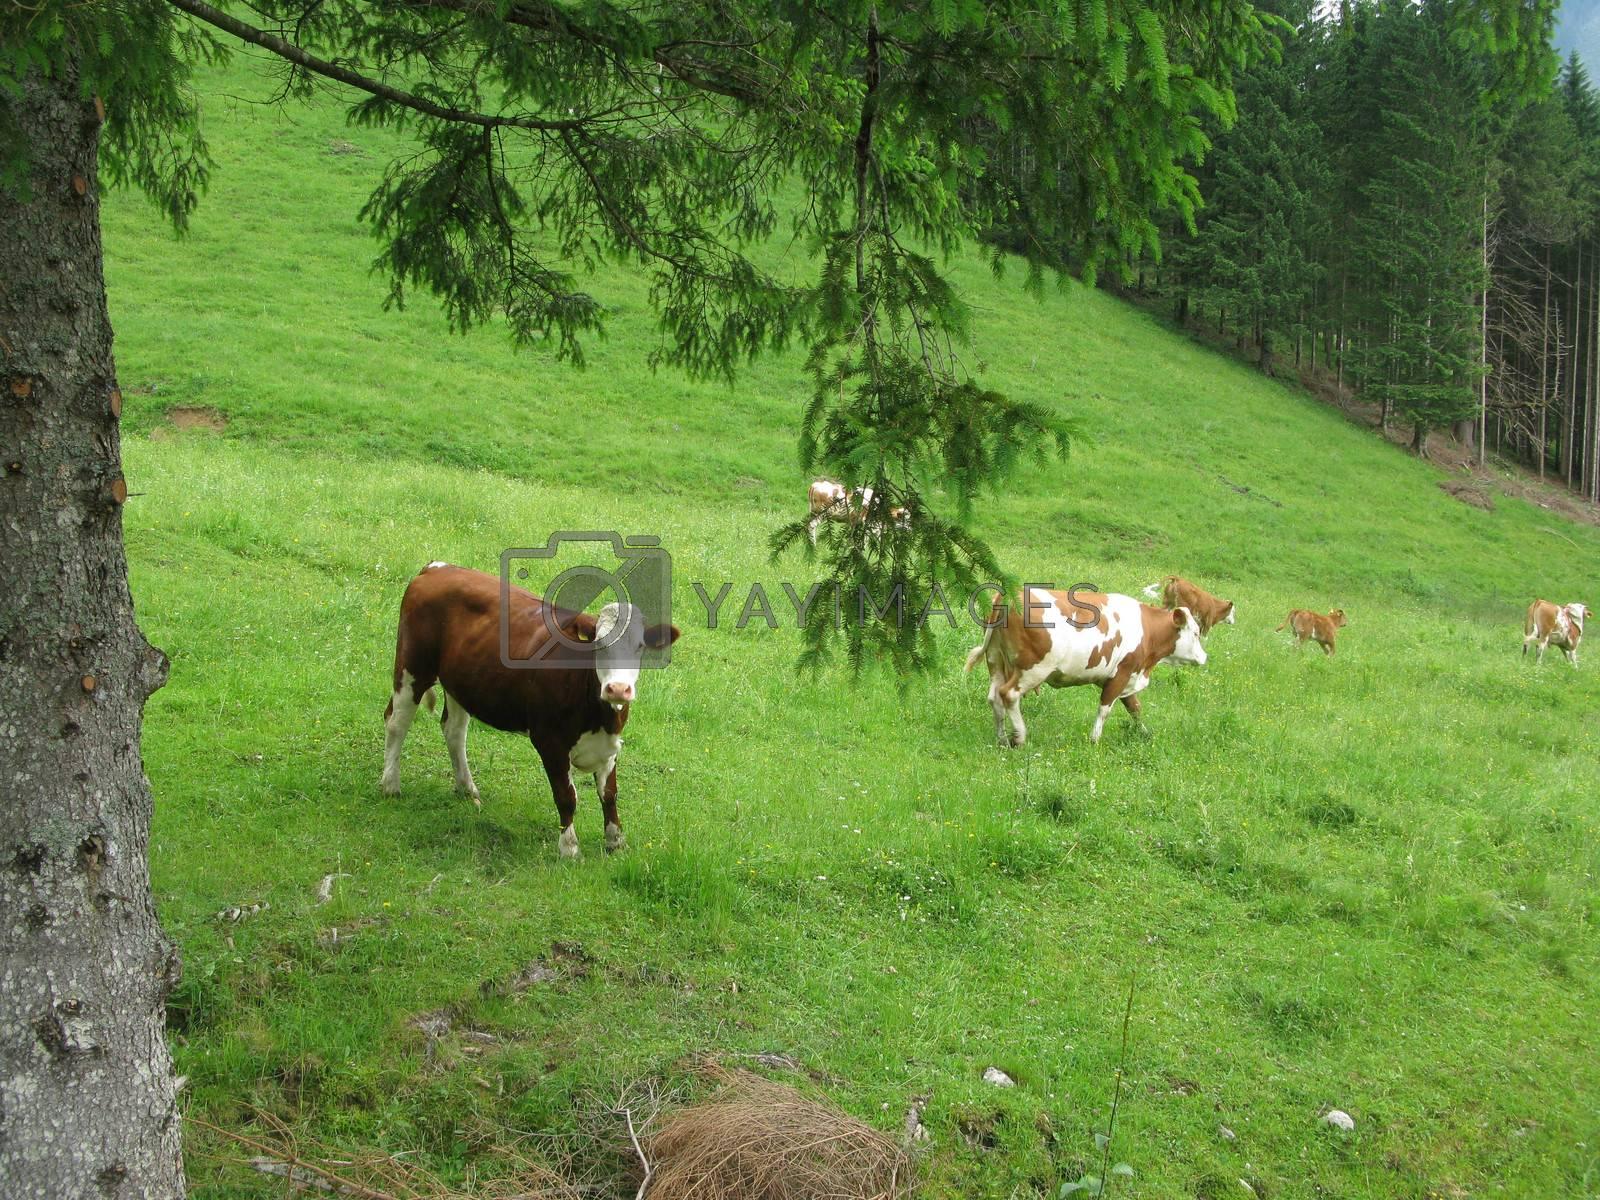 Herd of cows in the alps walking up to higher grasslands